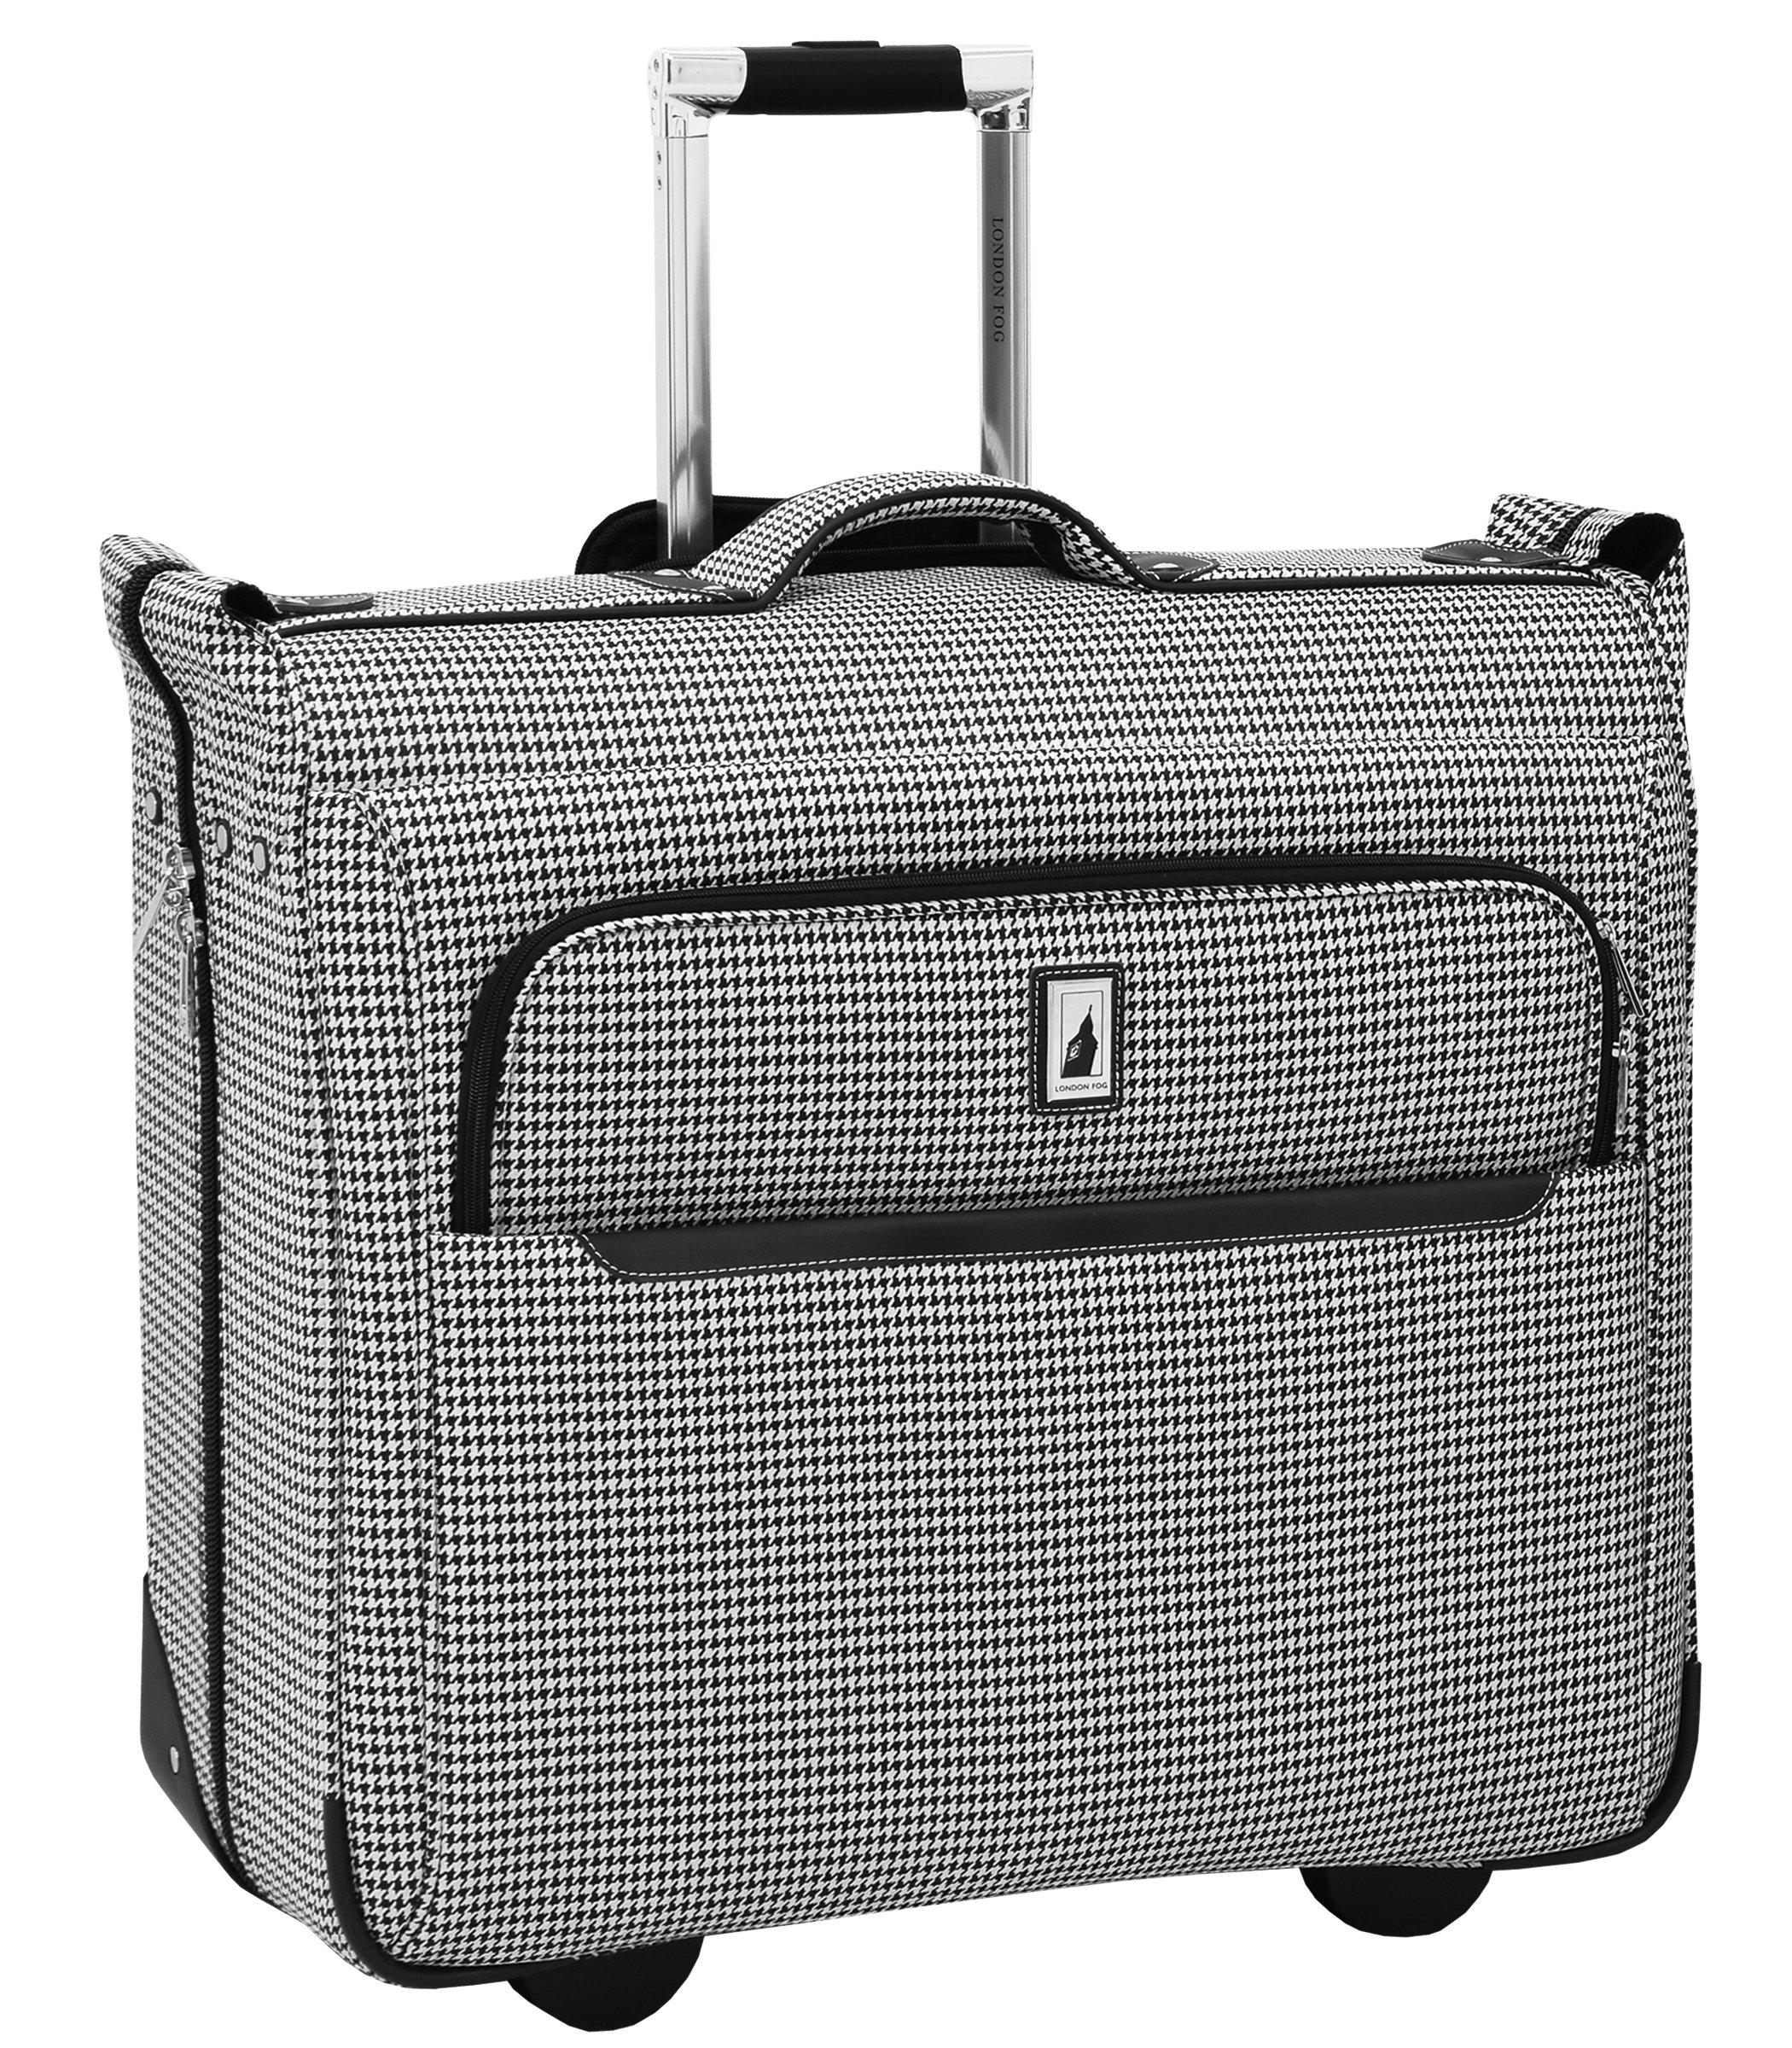 London Fog Cambridge II 44'' Wheeled Garment Bag, Black White Houndstooth